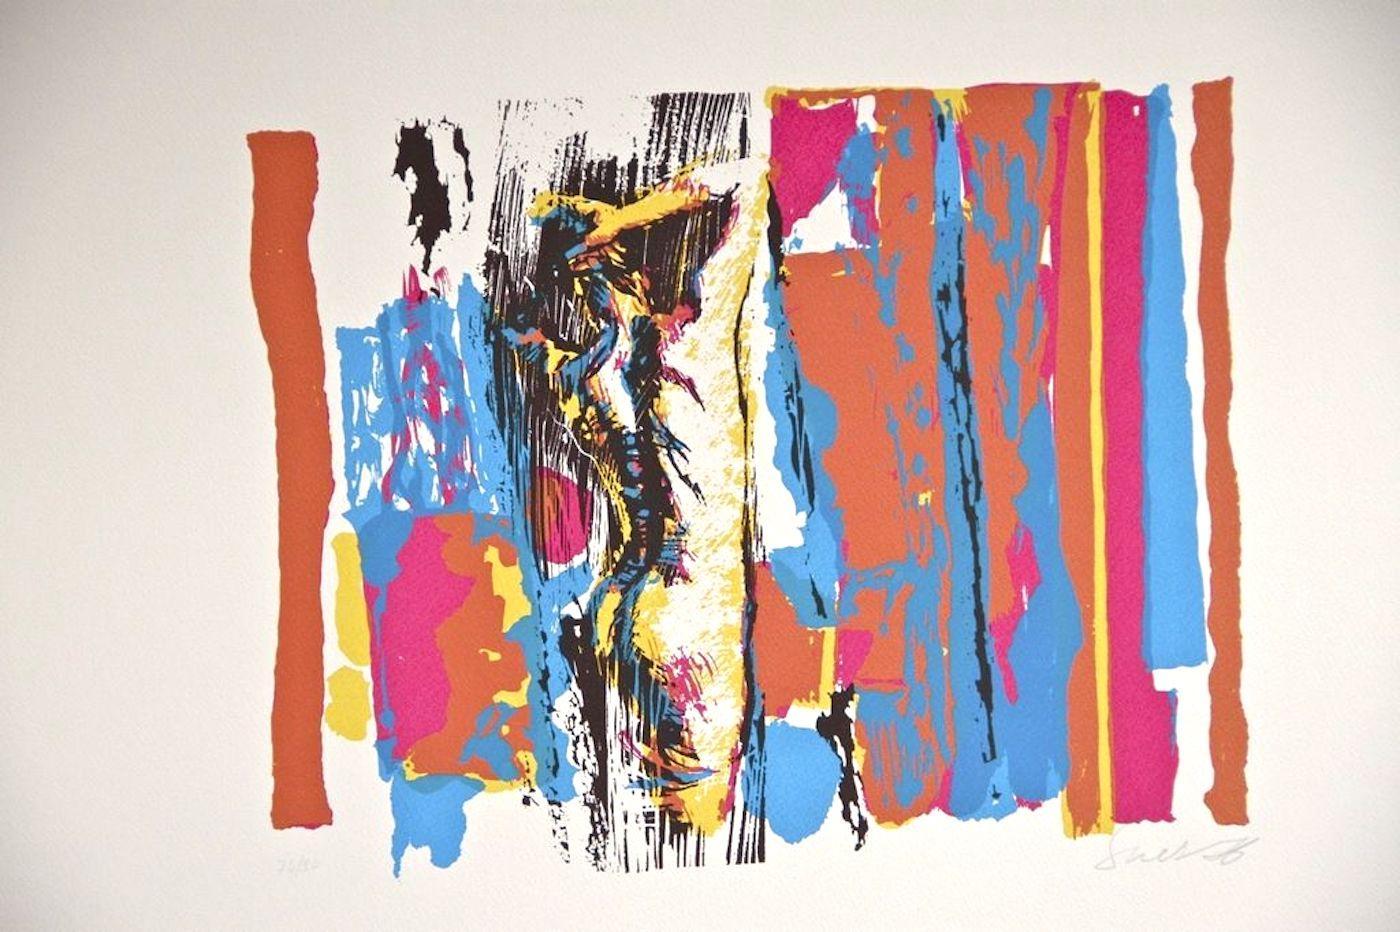 Rounded Nude in White - Original Screen Print by Nicola Simbari - 1976